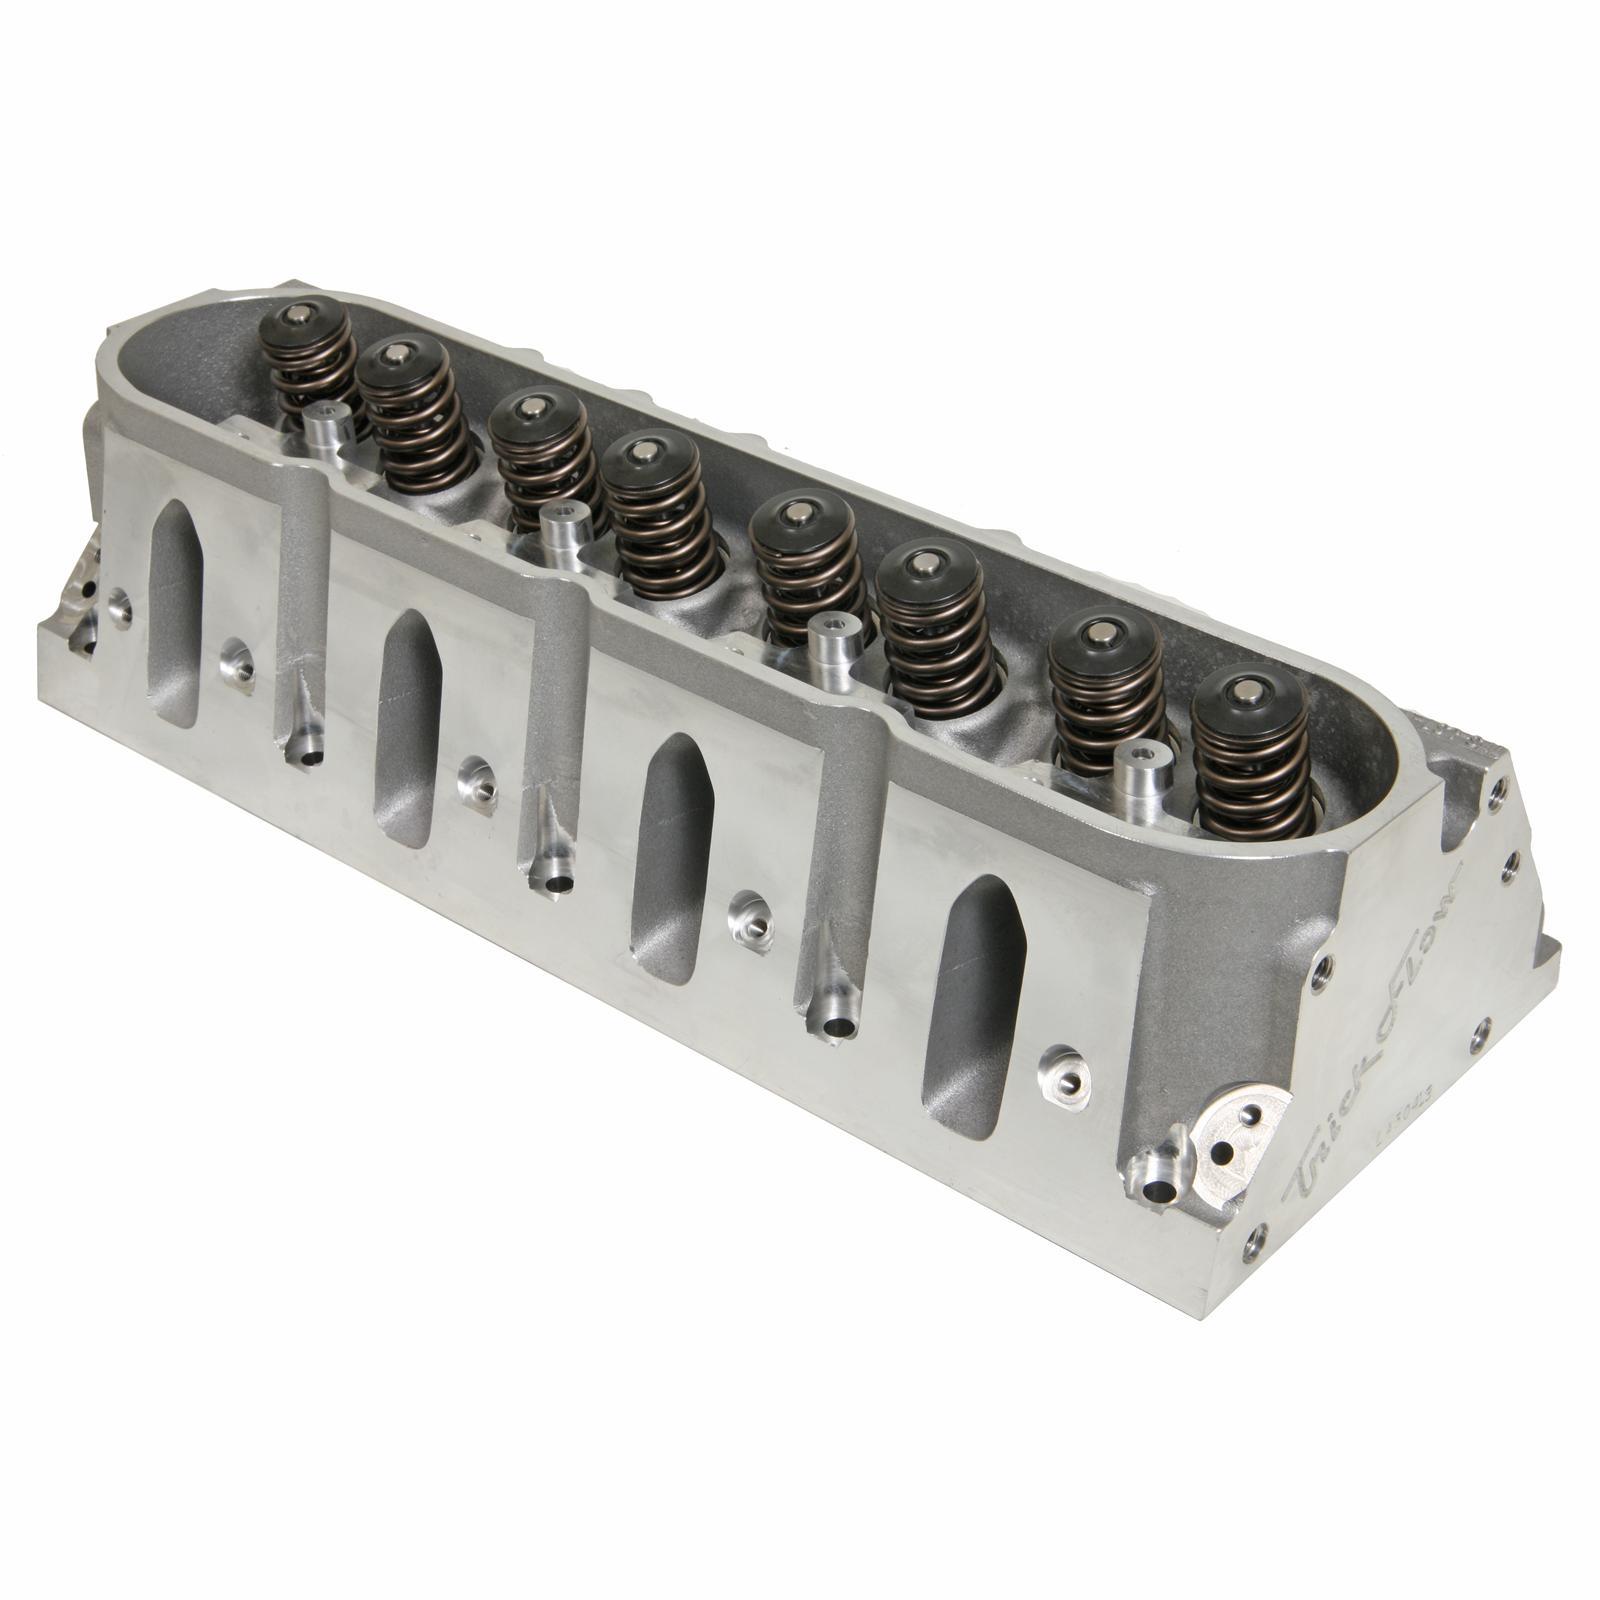 Ls1 Heads On Lr4: Trick Flow« GenX« 220 Cylinder Head For GM LS2 30610002